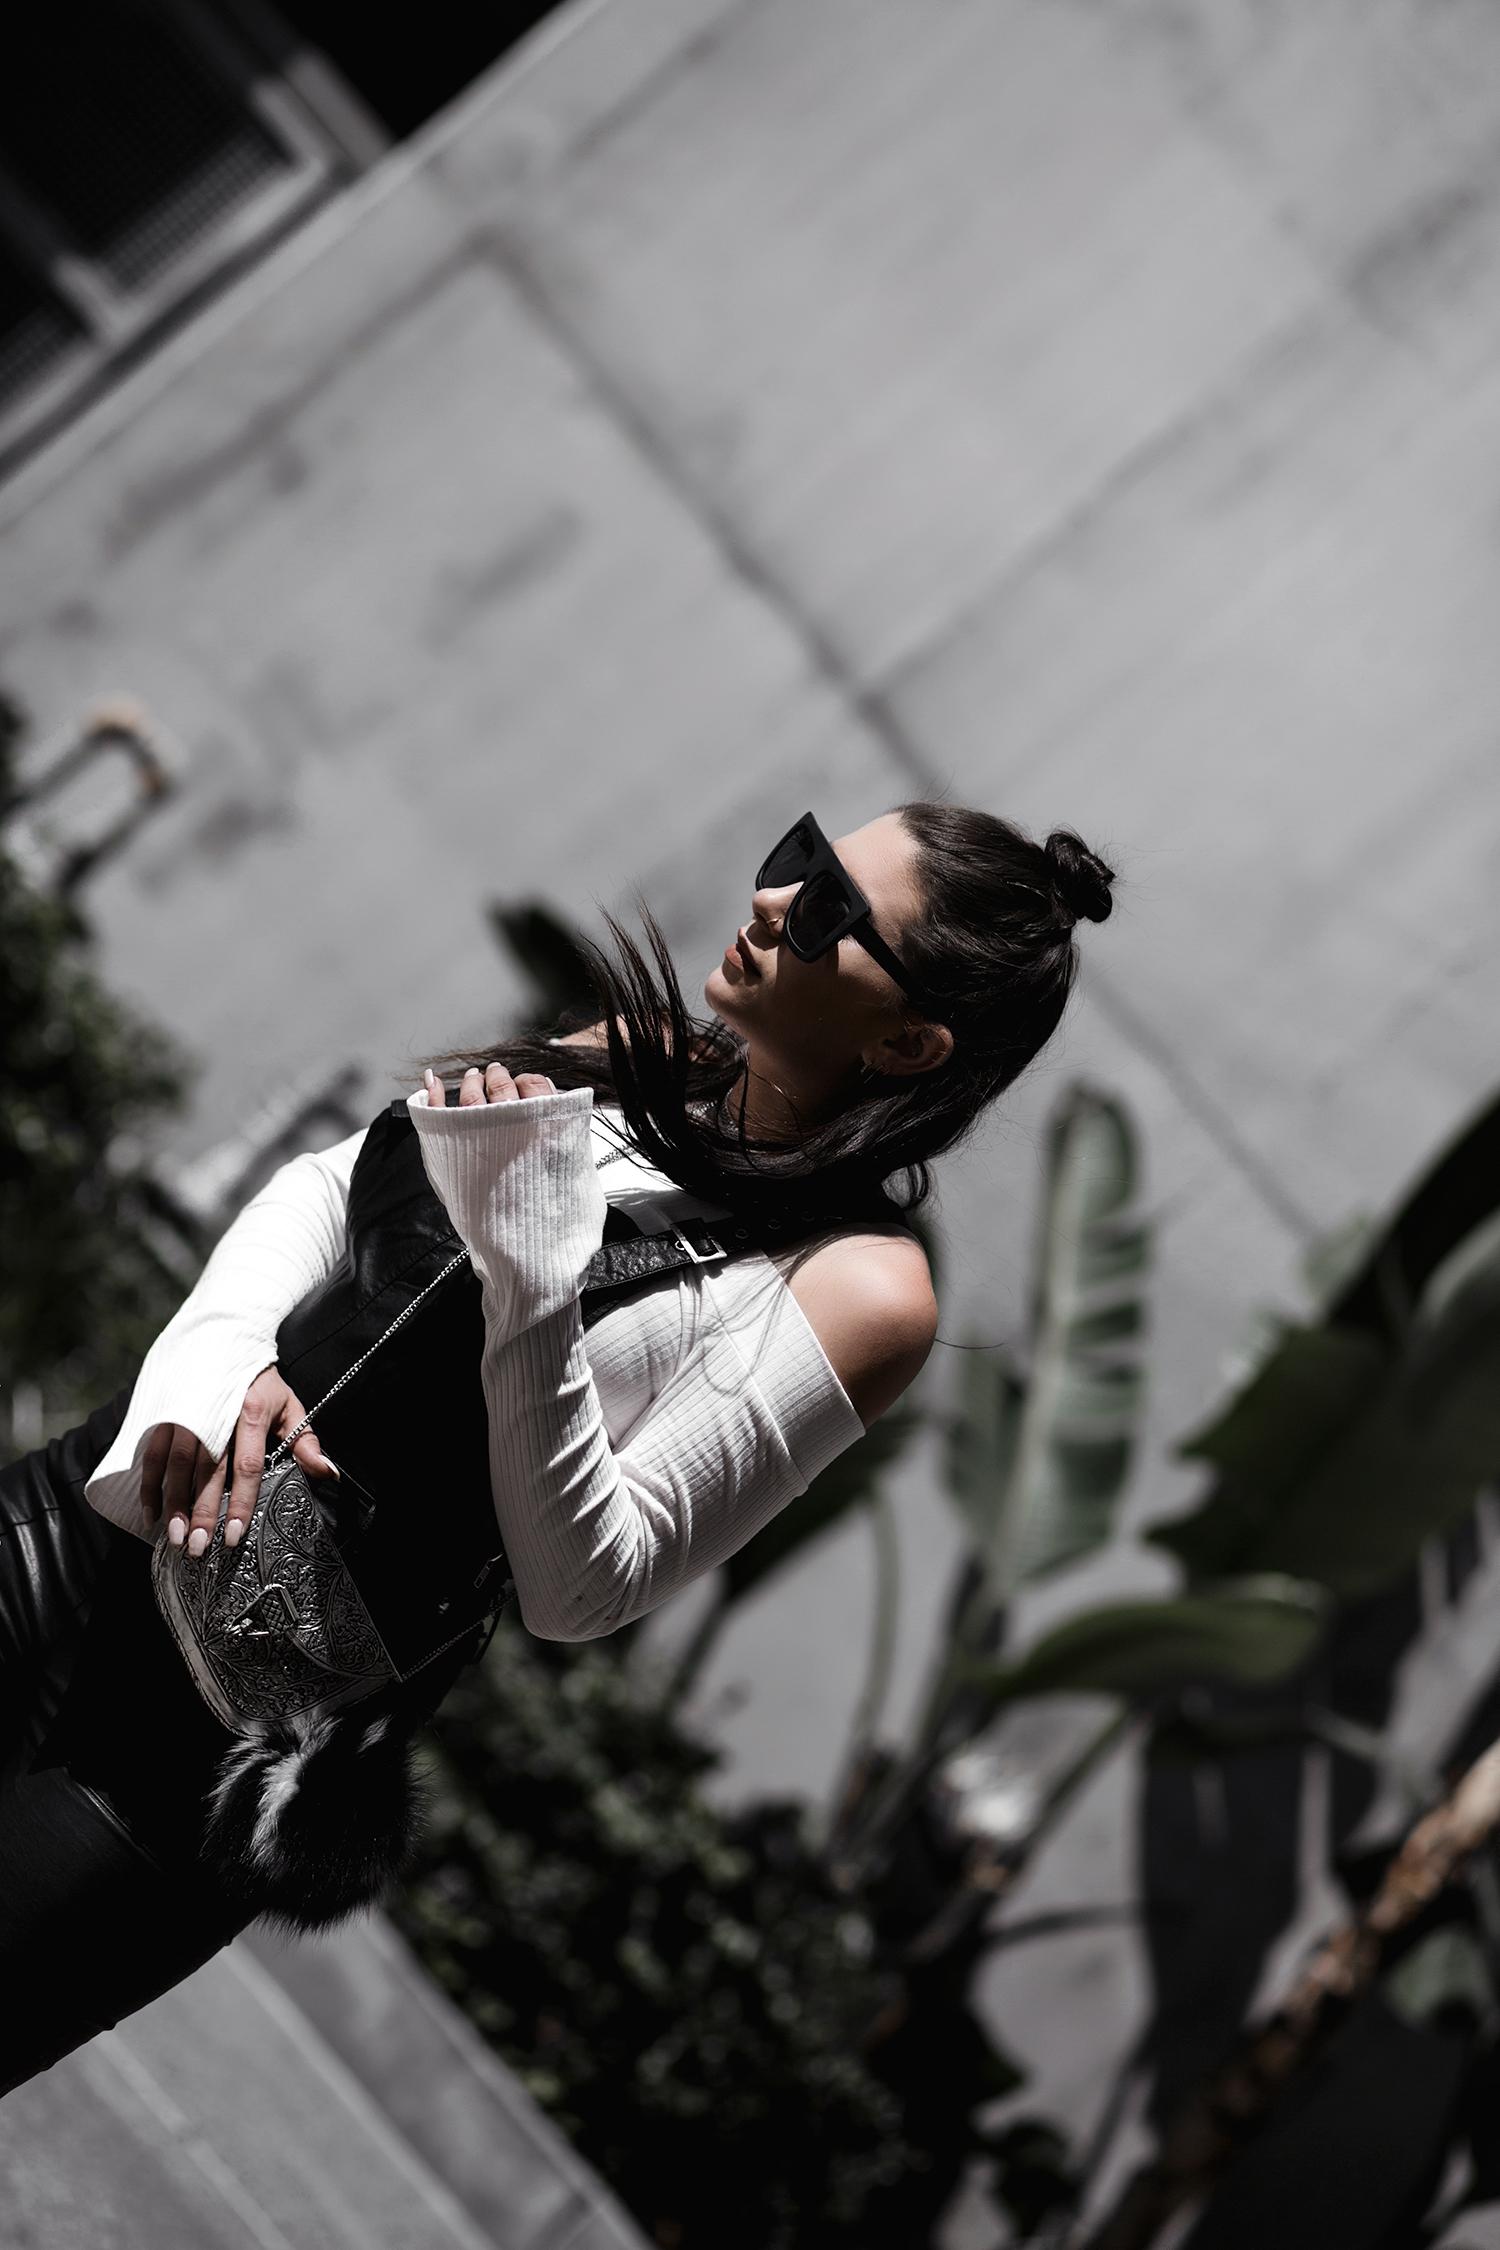 fashionlush, leather overalls, blogging relationship